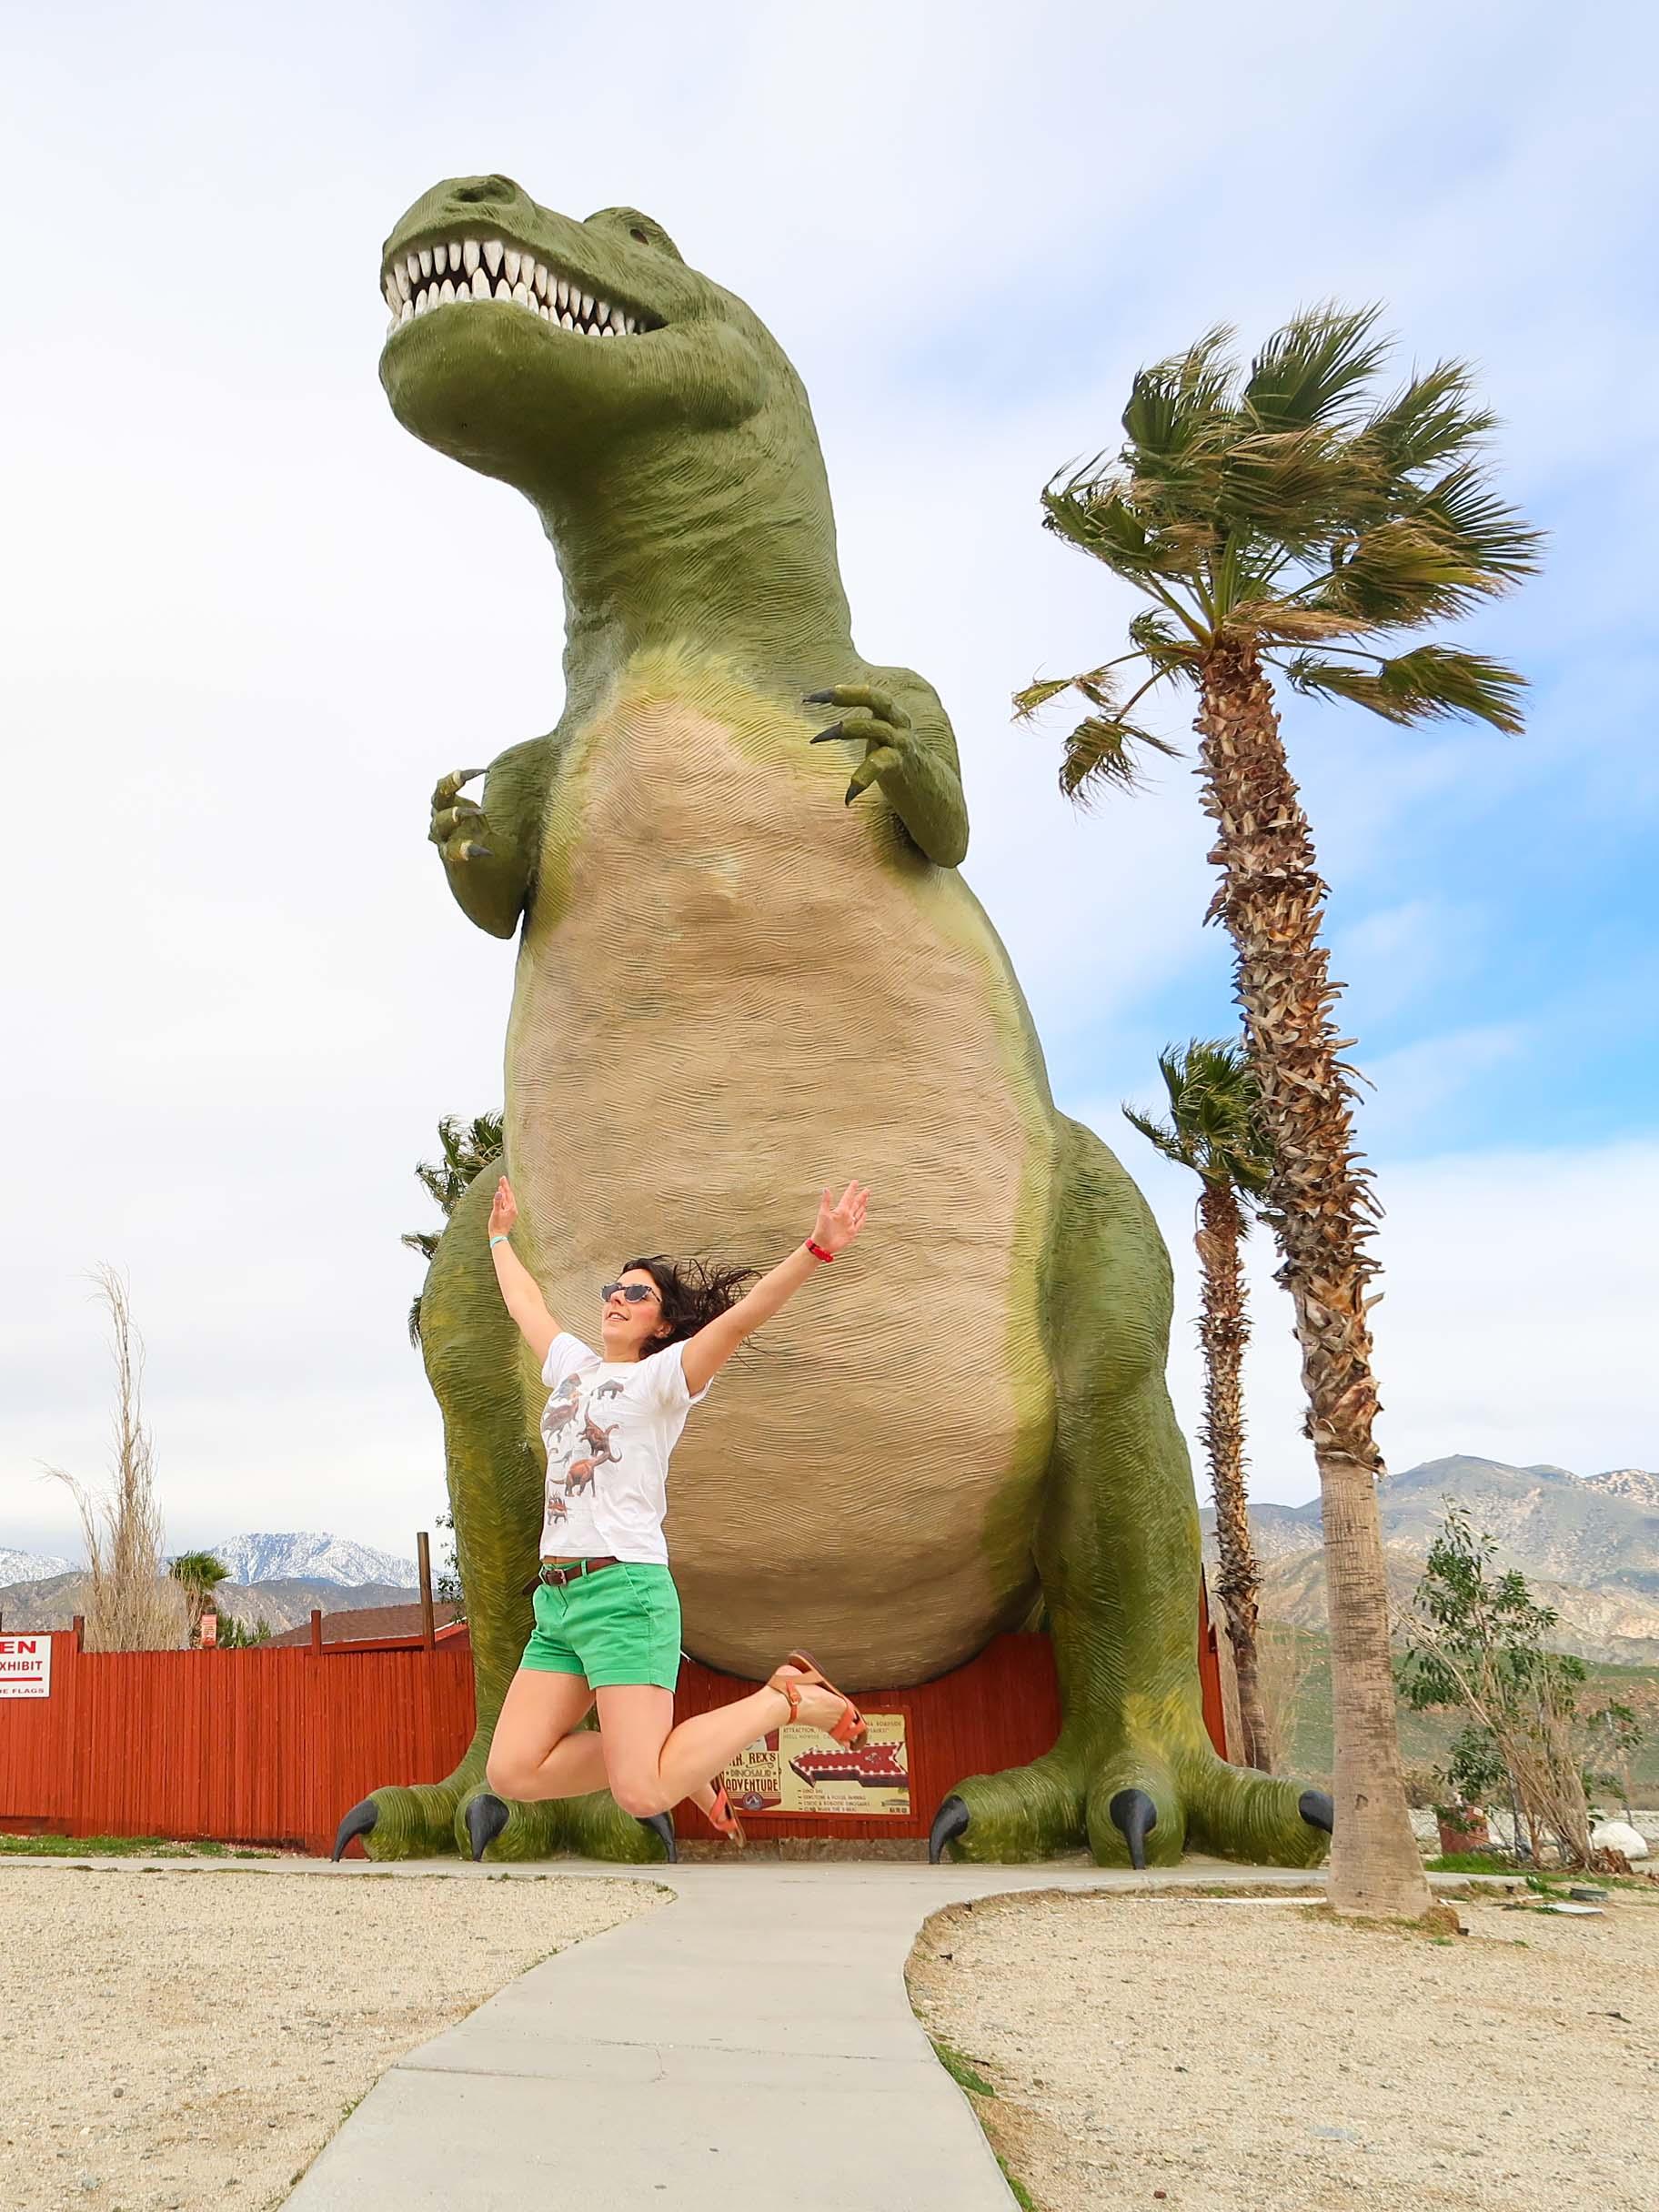 The Cabazon Dinosaurs, Palm Springs